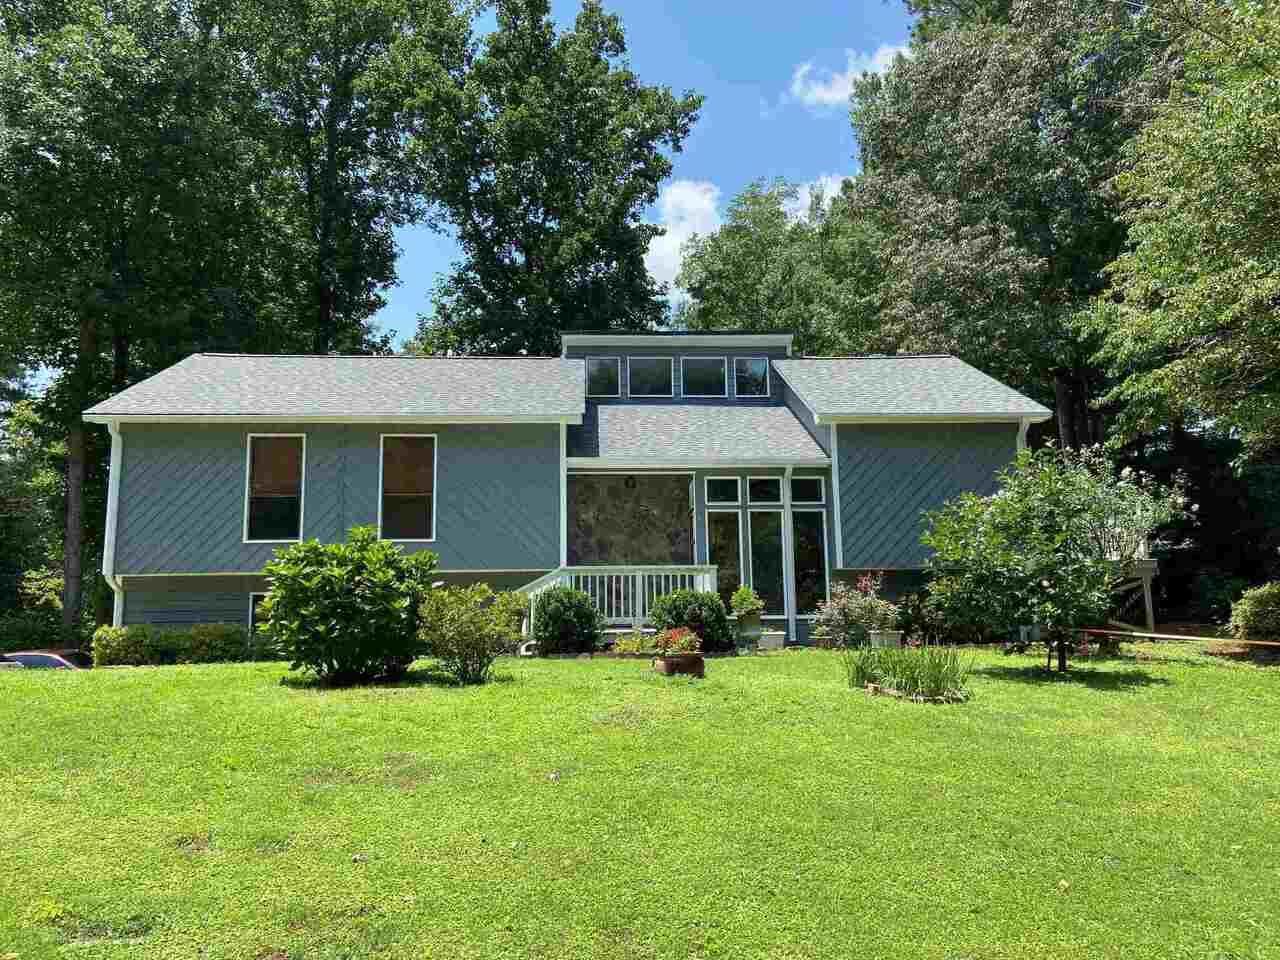 3271 Rae Place, Lawrenceville, GA 30044 - MLS#: 9005028